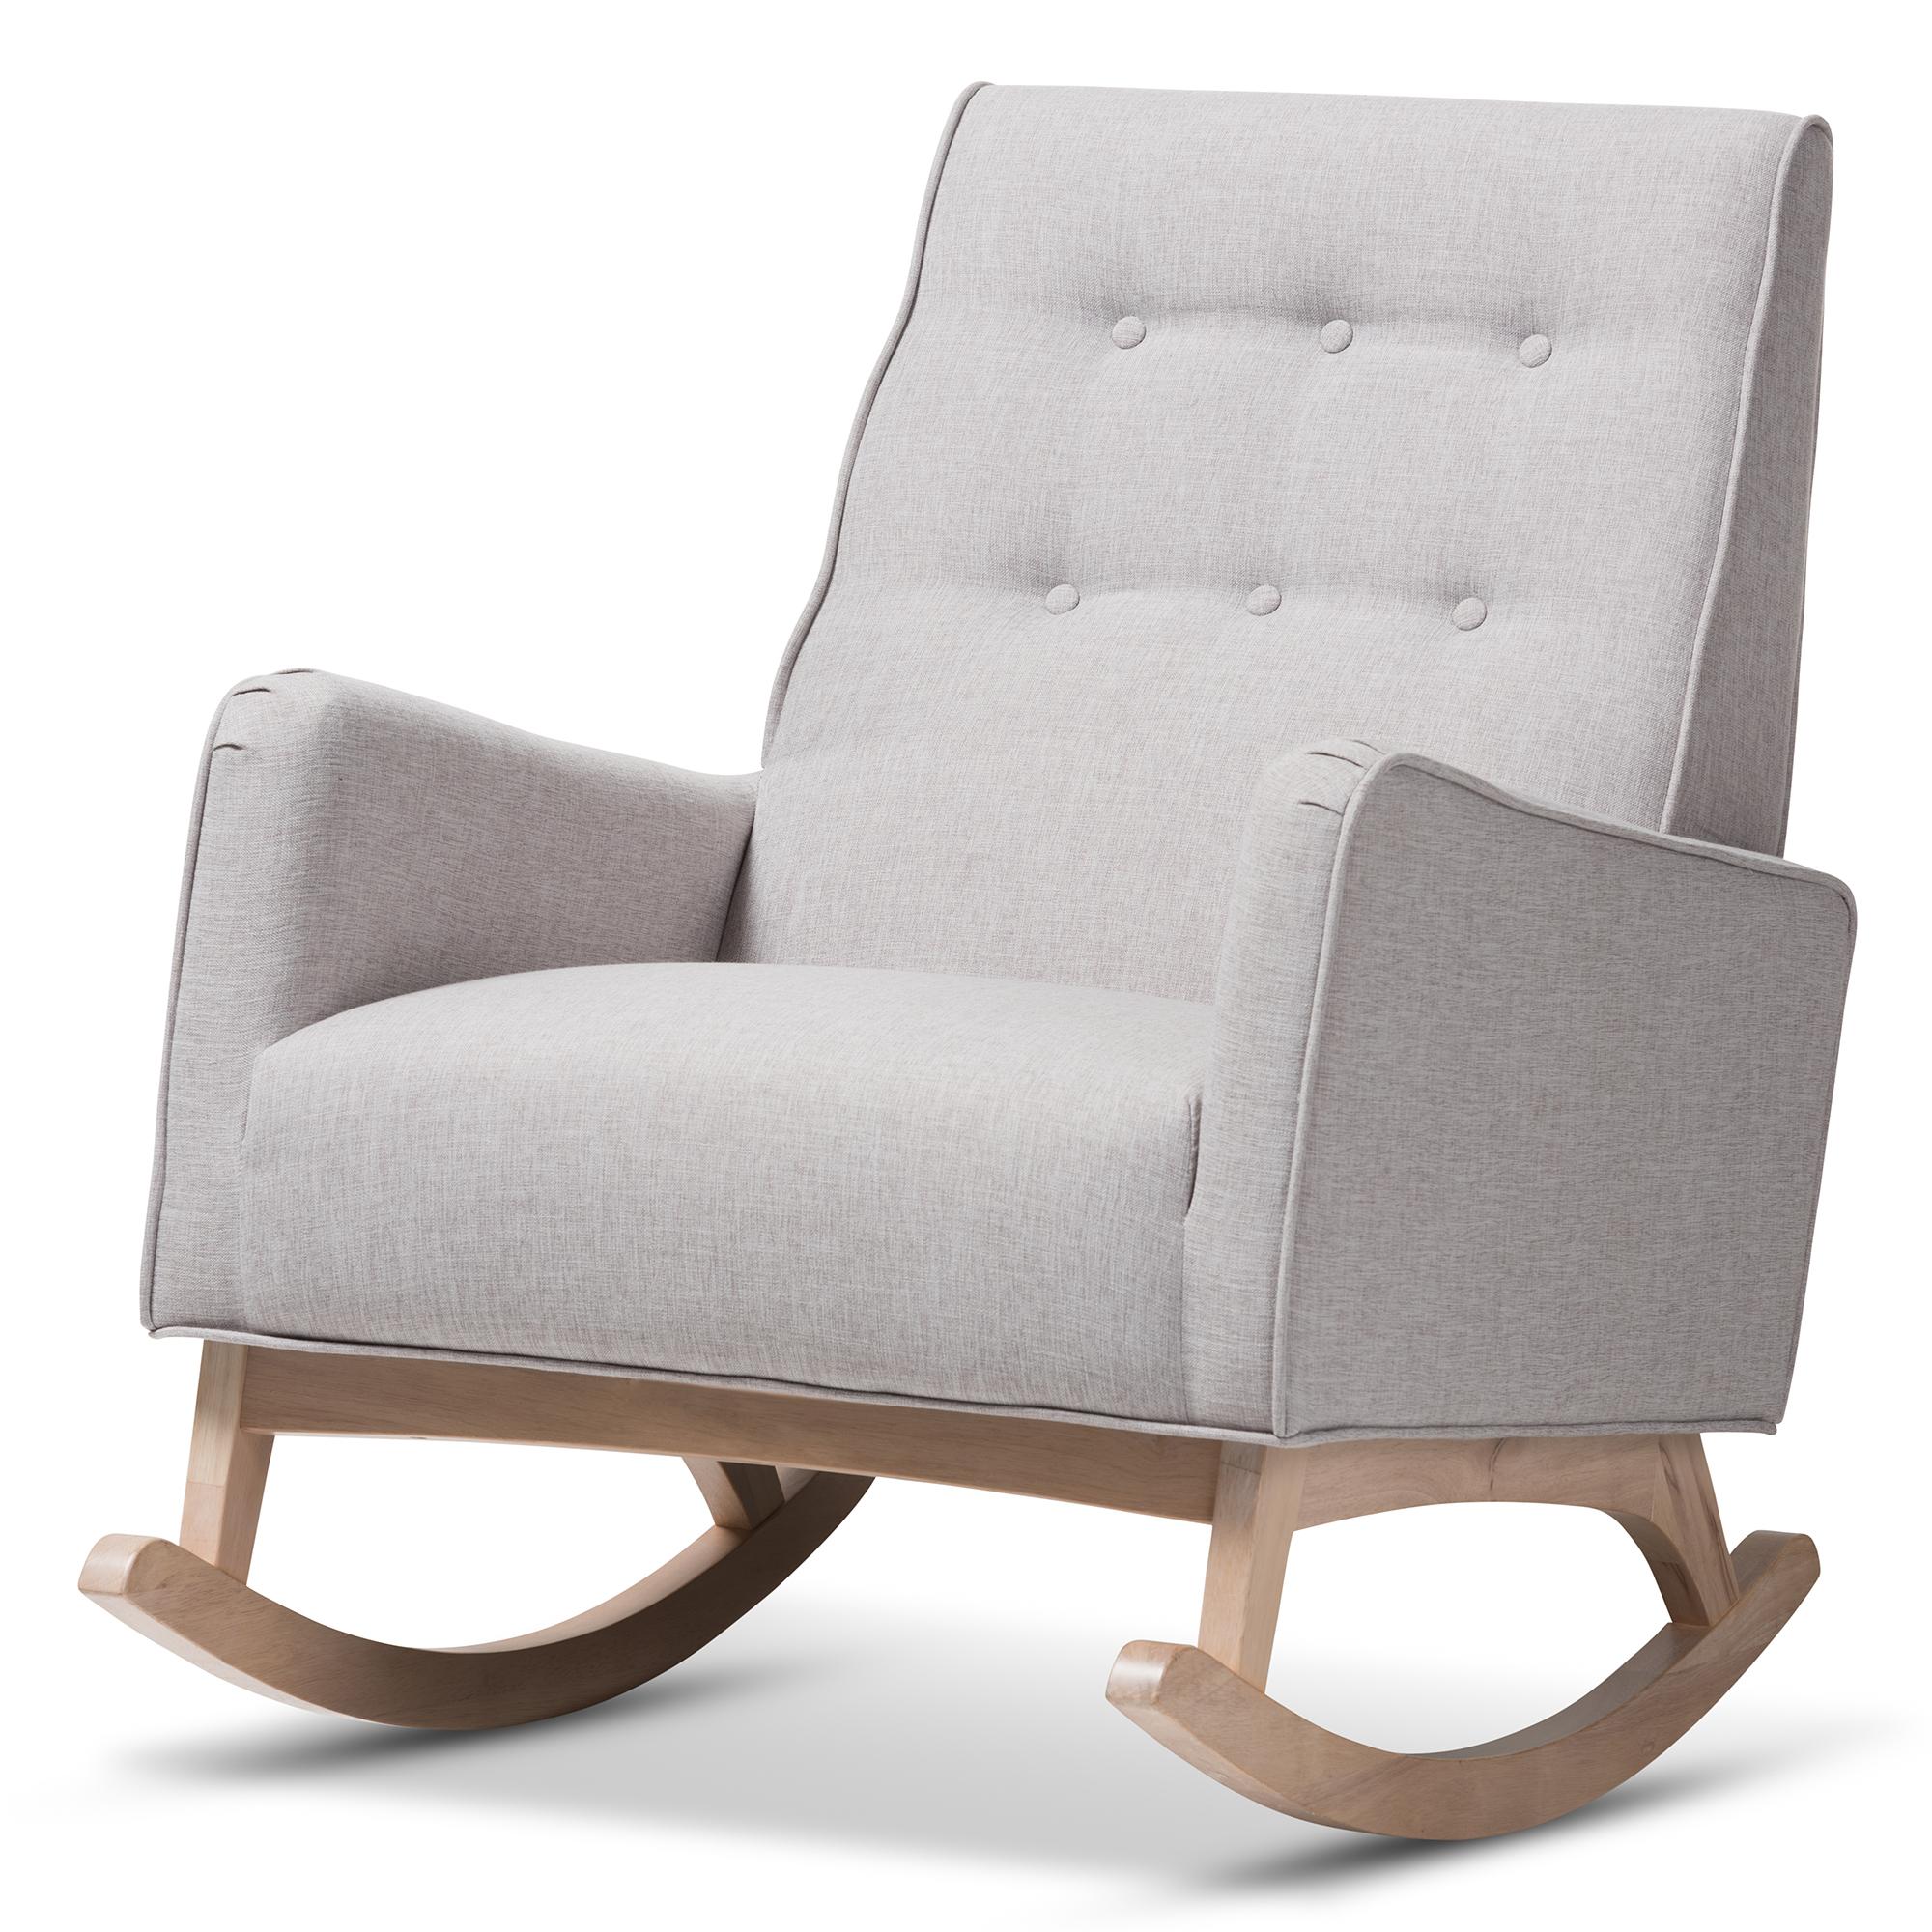 baxton studio marlena midcentury modern greyish beige